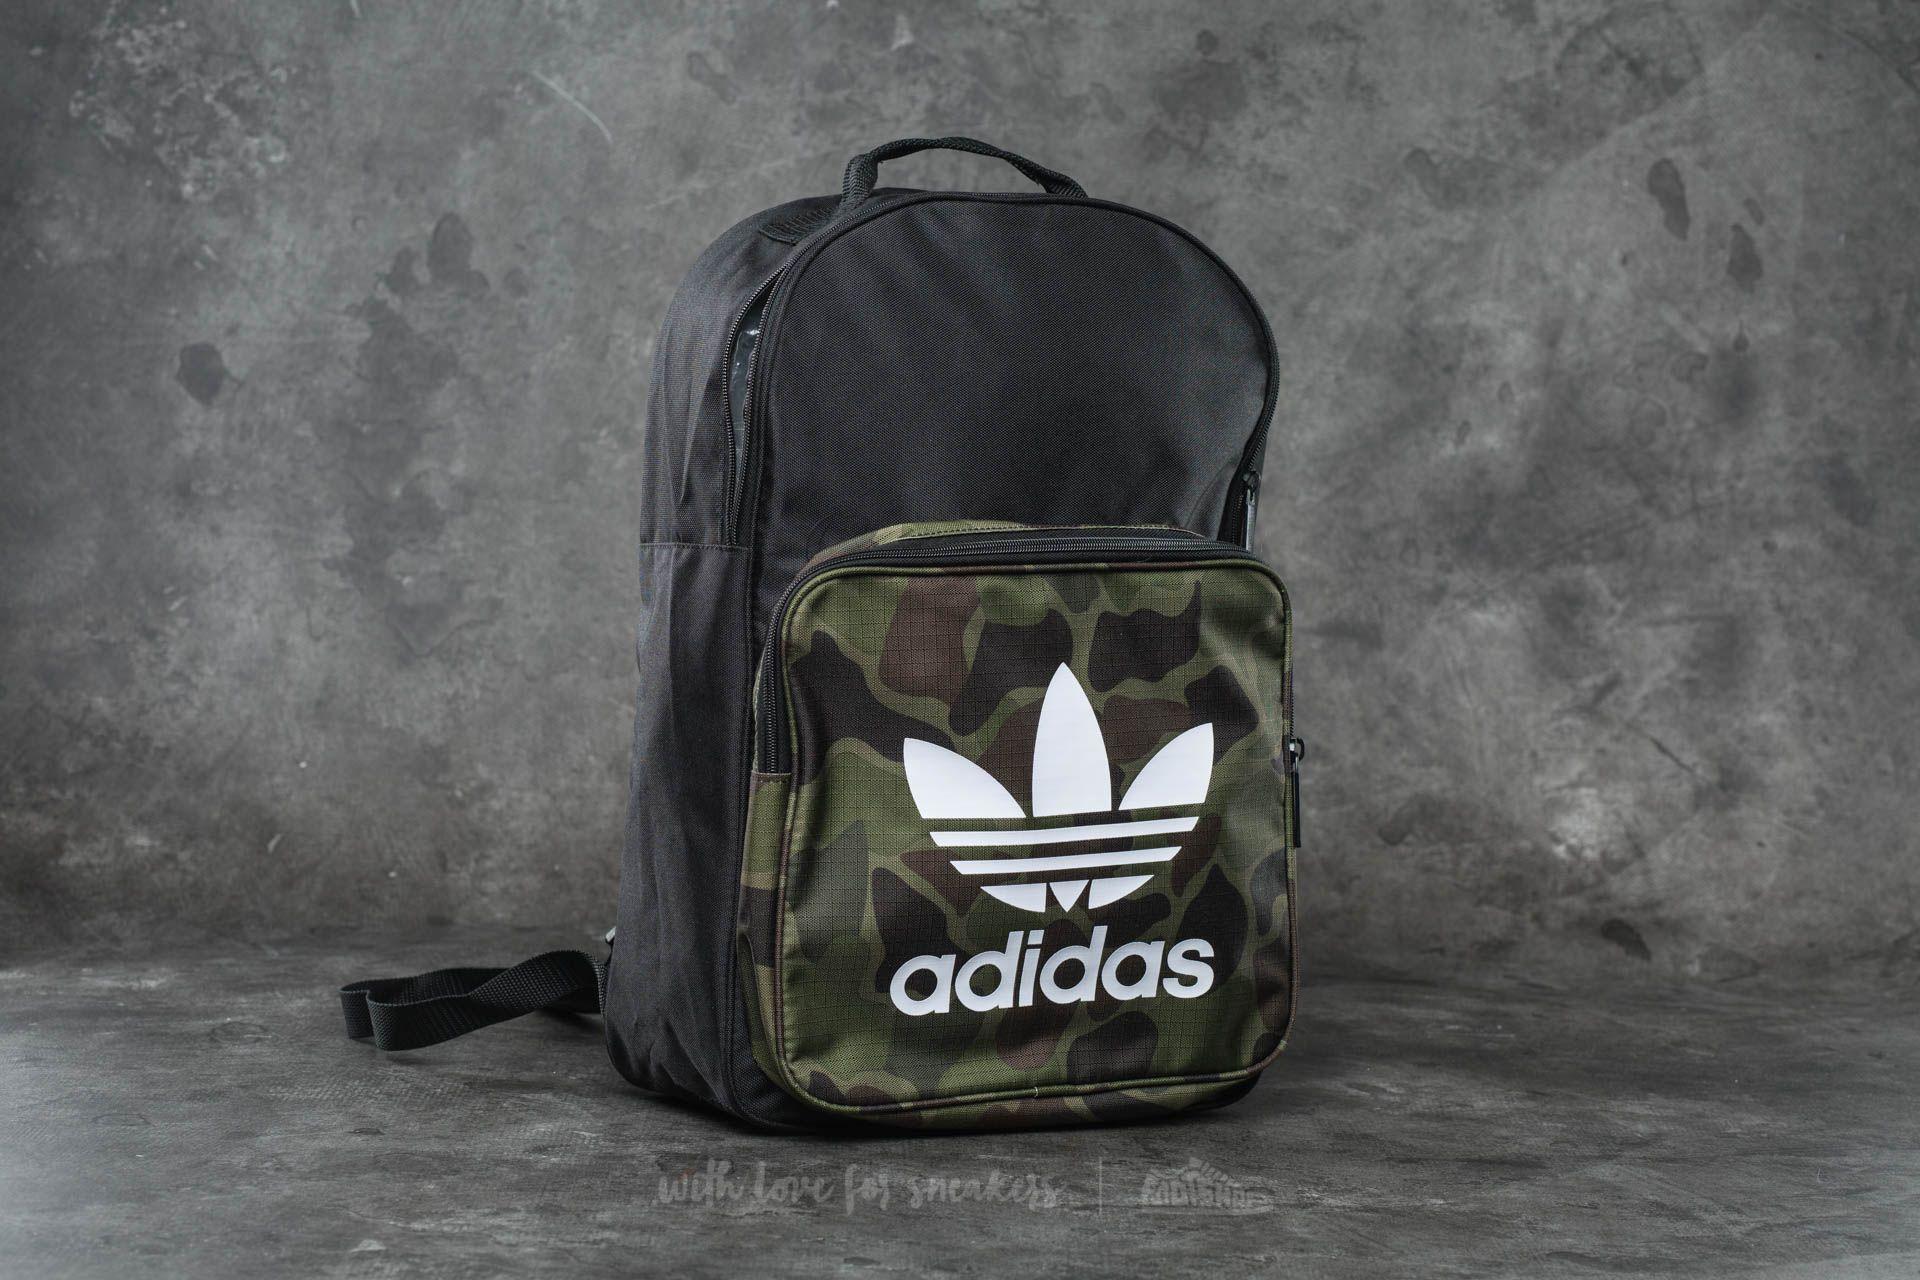 adidas Classic Camo Backpack Black  Multicolor  34536e74a0b64